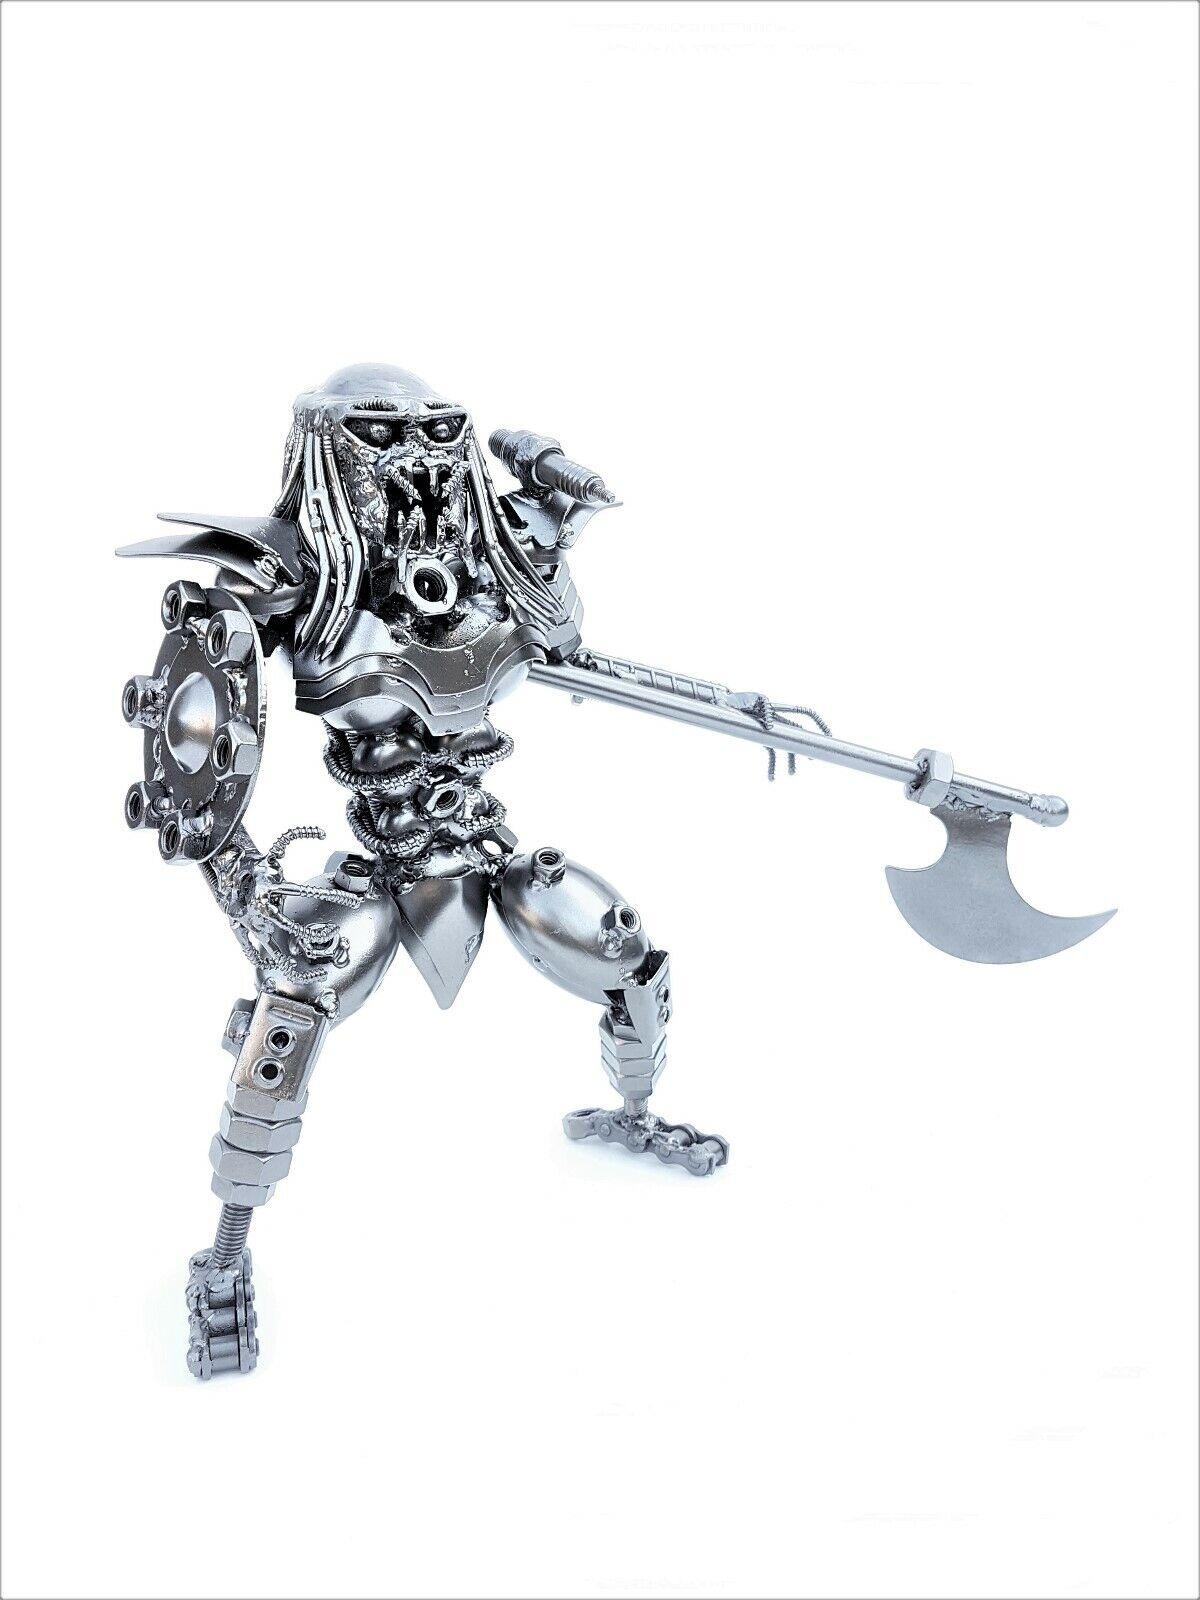 Protator Mask Off 30cm Axe & Shield Figure Metal Art Productions Sculpture